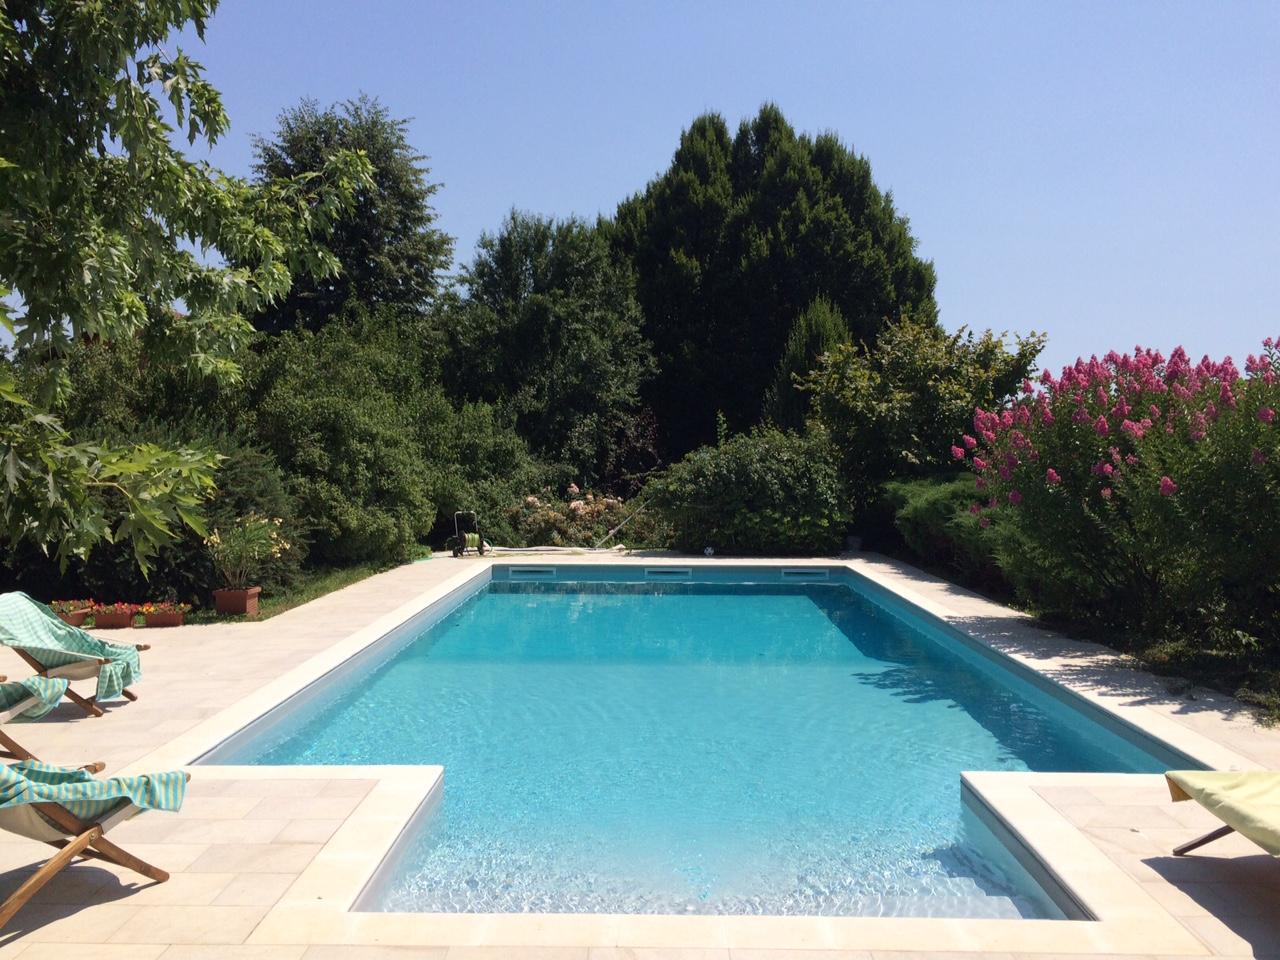 ristrutturazione piscina fase finale